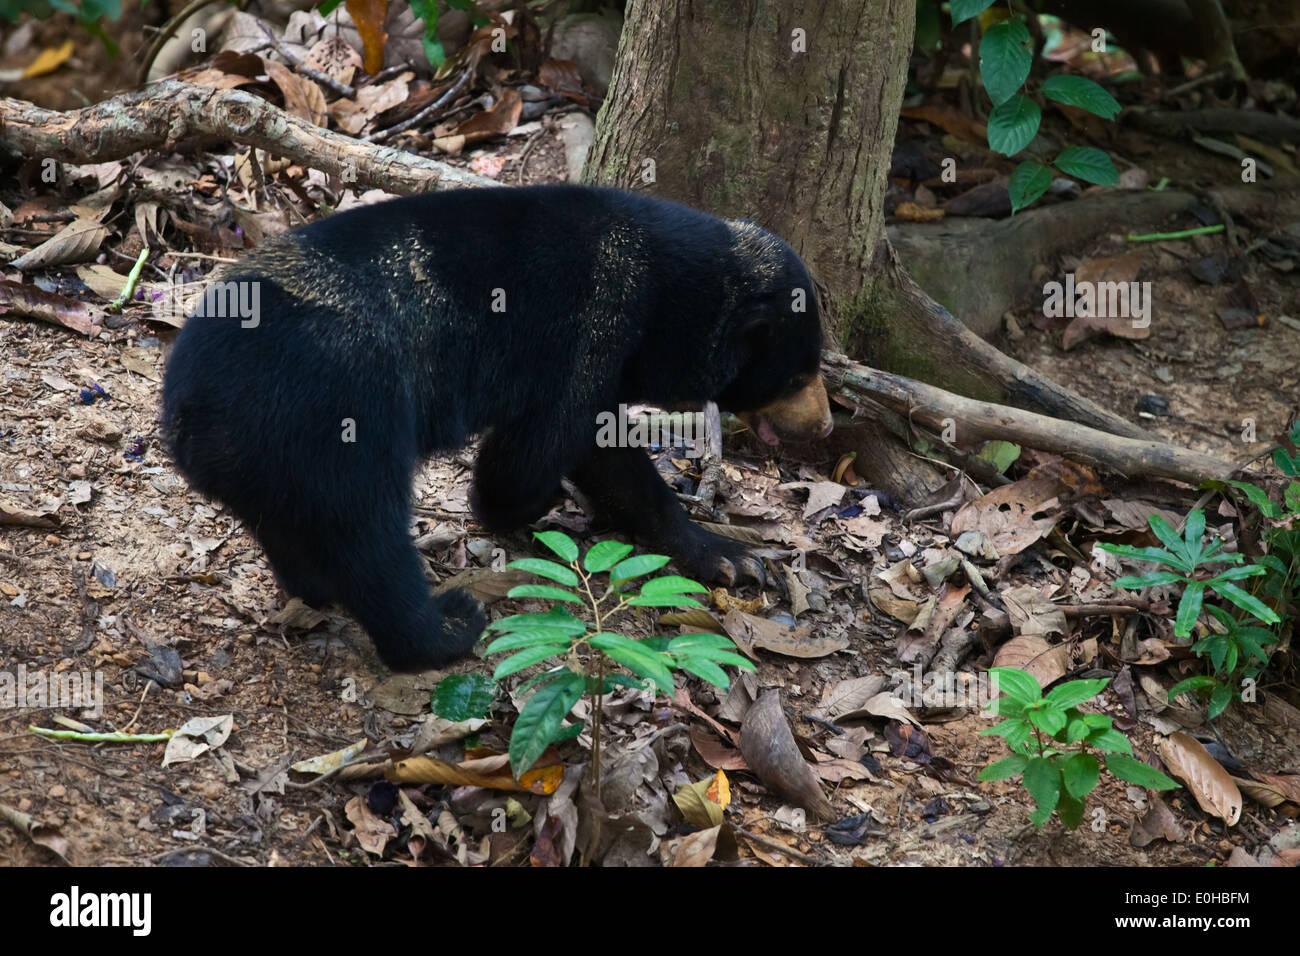 A sun bear (Helarctos malayanus) at the Bornean Sun Bear Conservation Center located near Sandakan in Sepilok - MALAYSIA, BORNEO - Stock Image